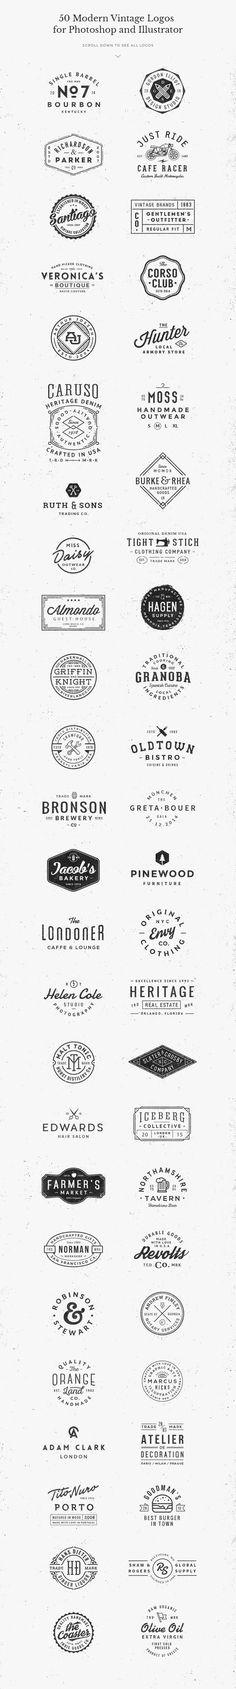 50 Logo Mock-ups + 50 Logo Templates by GraphicBurger on Creative Market: